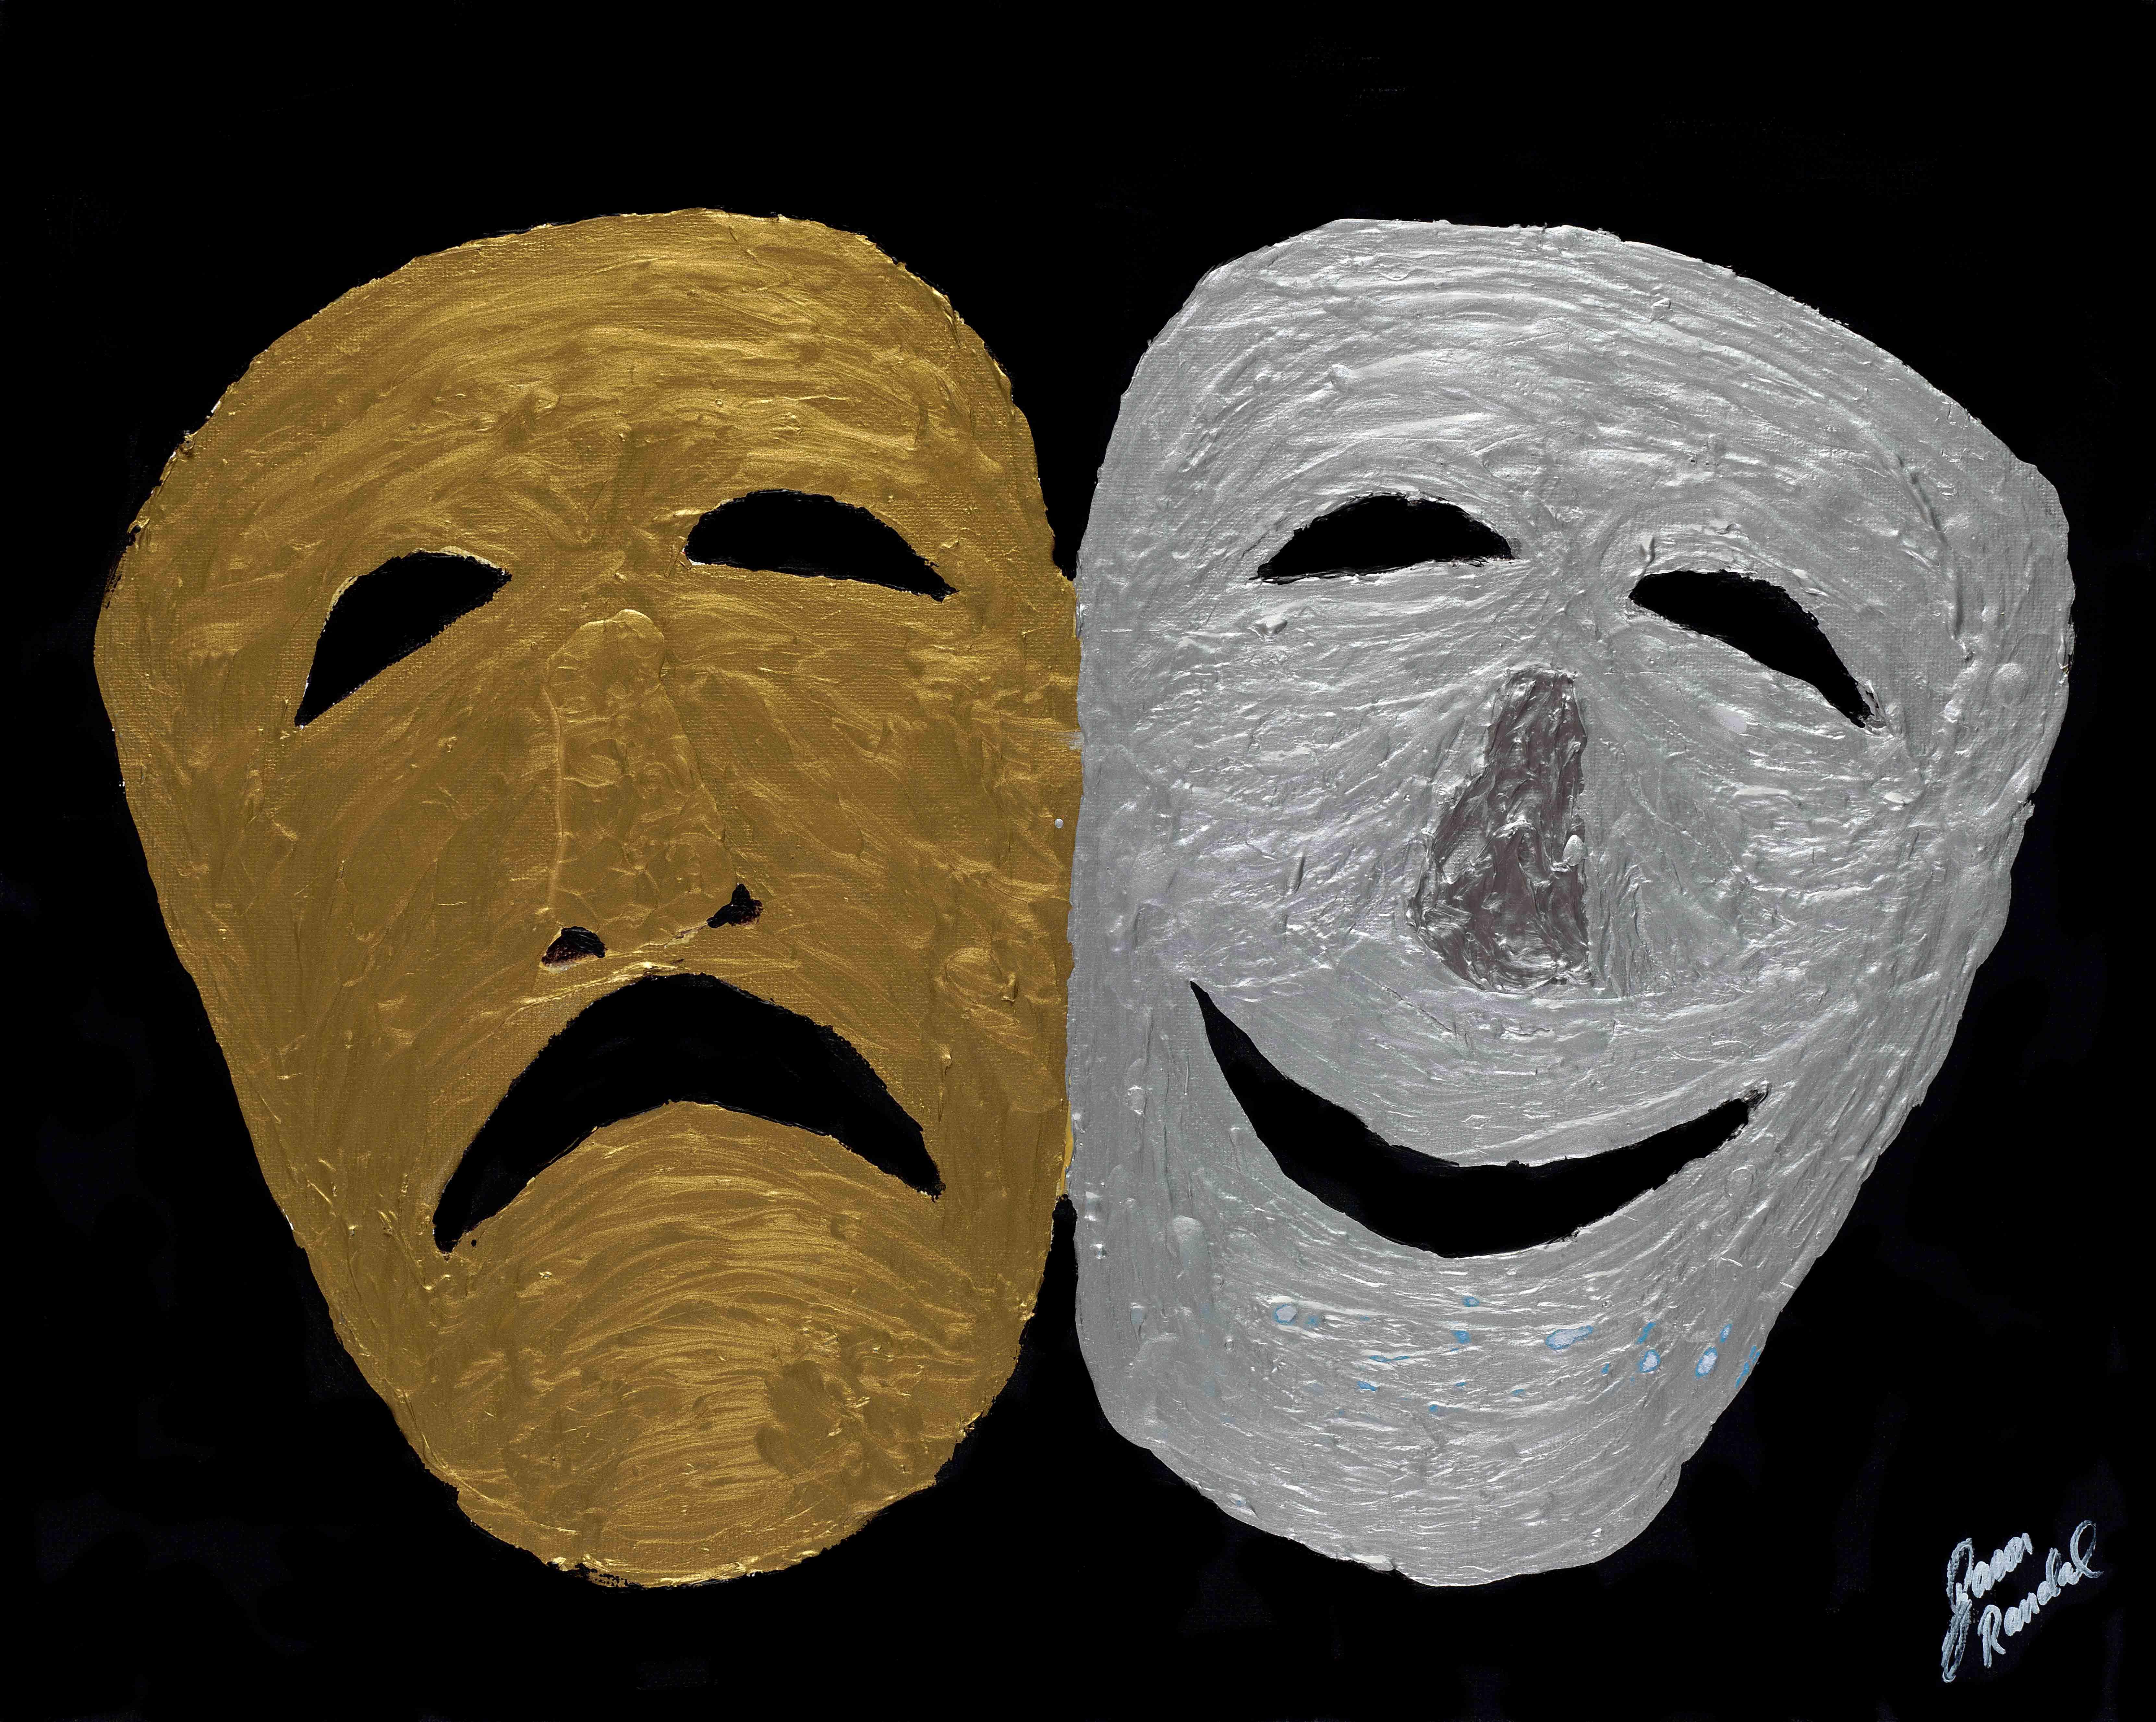 Mummy Masks, 5/3/13, 4:32 PM, 8C, 6000x8000 (0+0), 100%, Custom, 1/25 s, R119.2, G94.9, B115.6